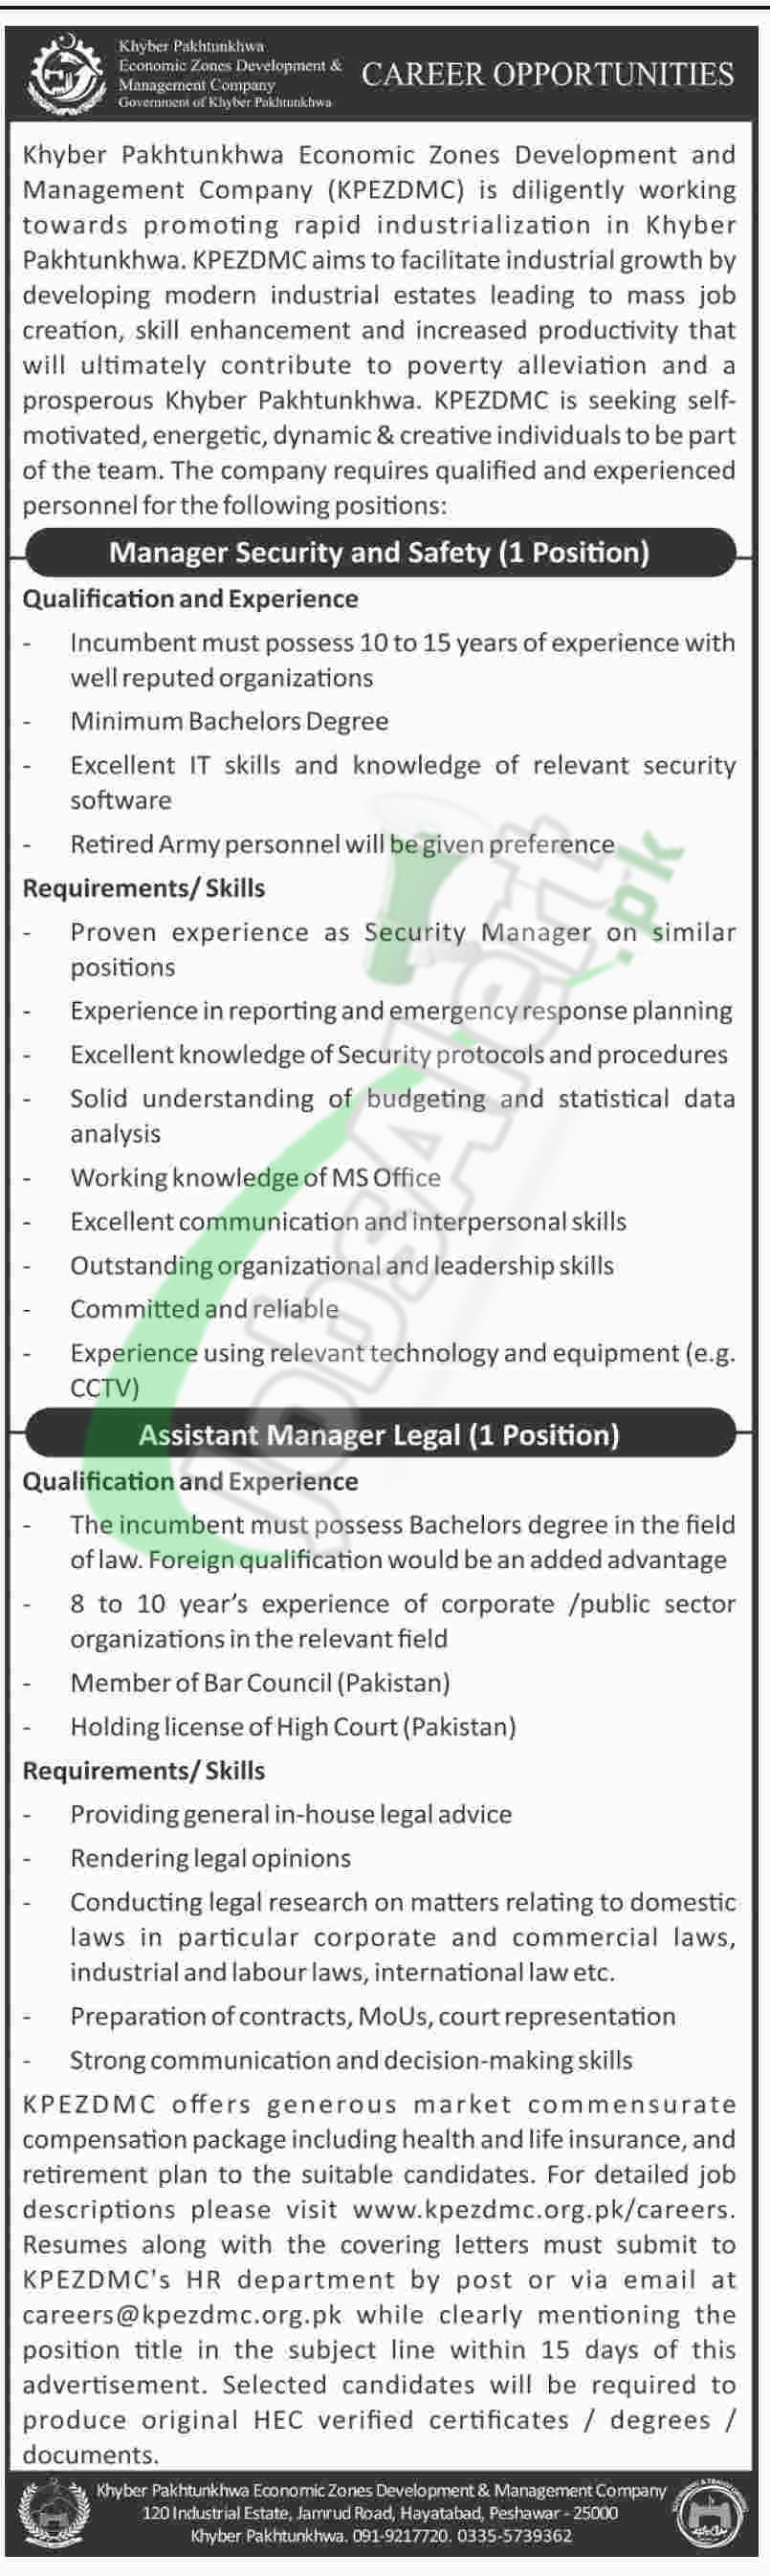 KPK Economic Zone Development and Management Company Jobs